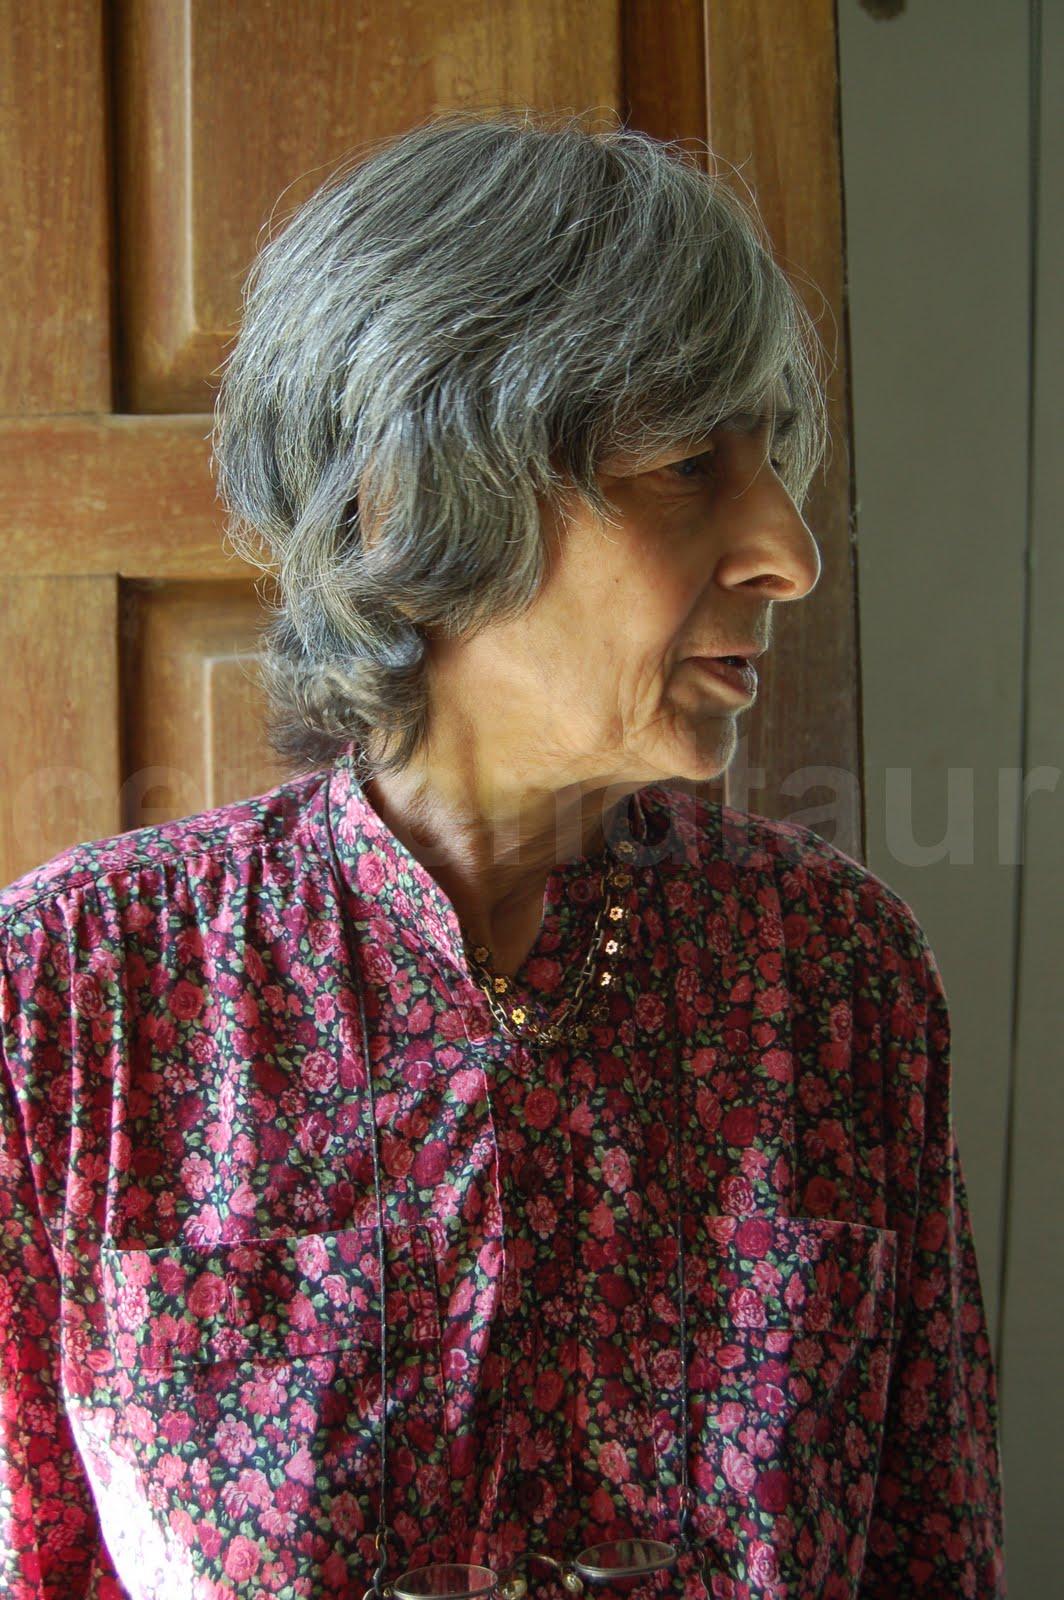 amina jilani remembered as a courageous writer